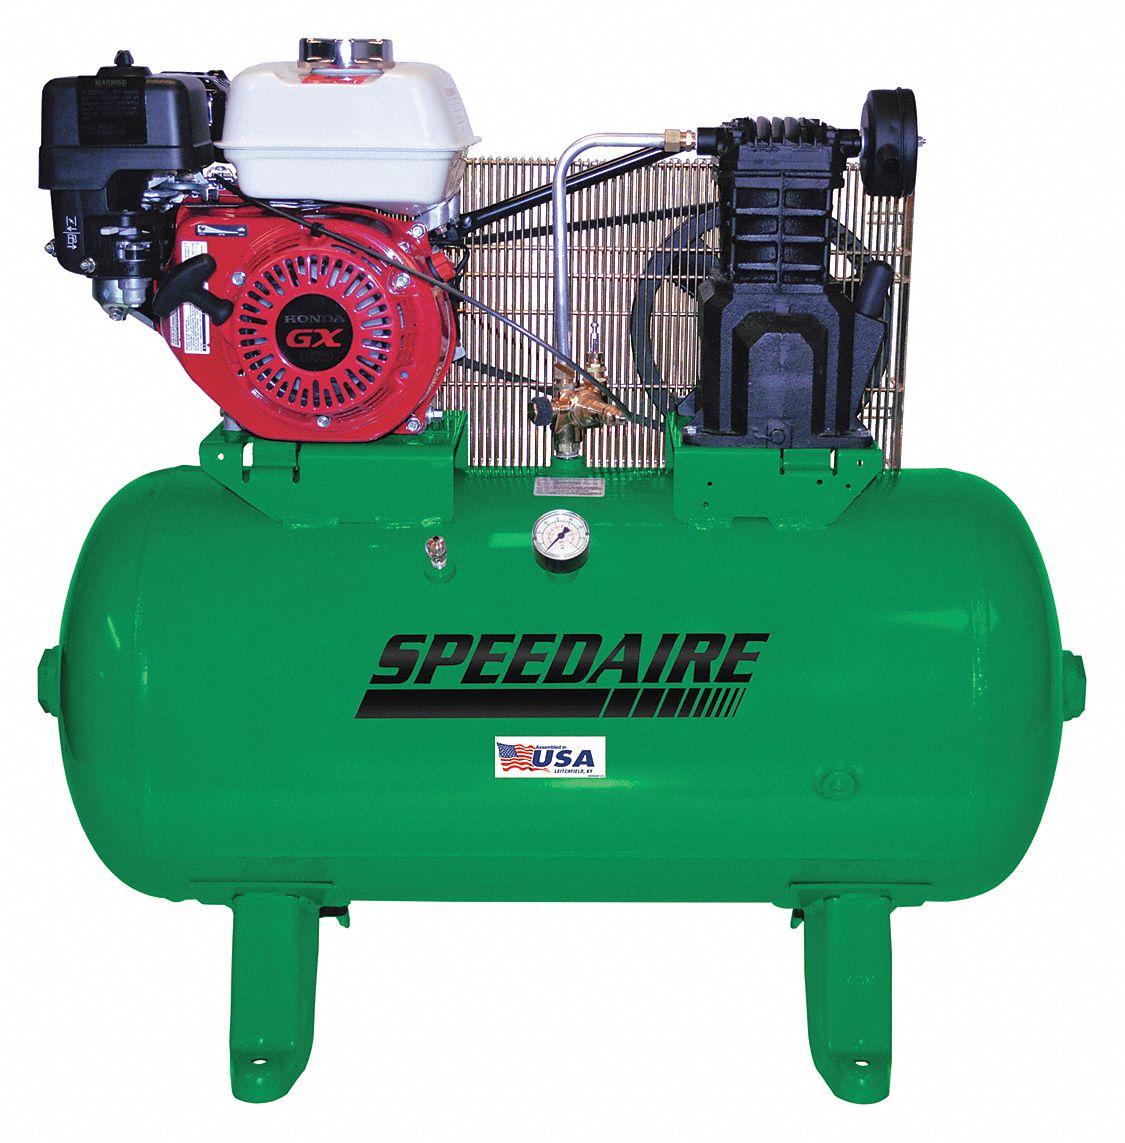 Piston, 5 5 Stationary Air Compressor, 30 gal